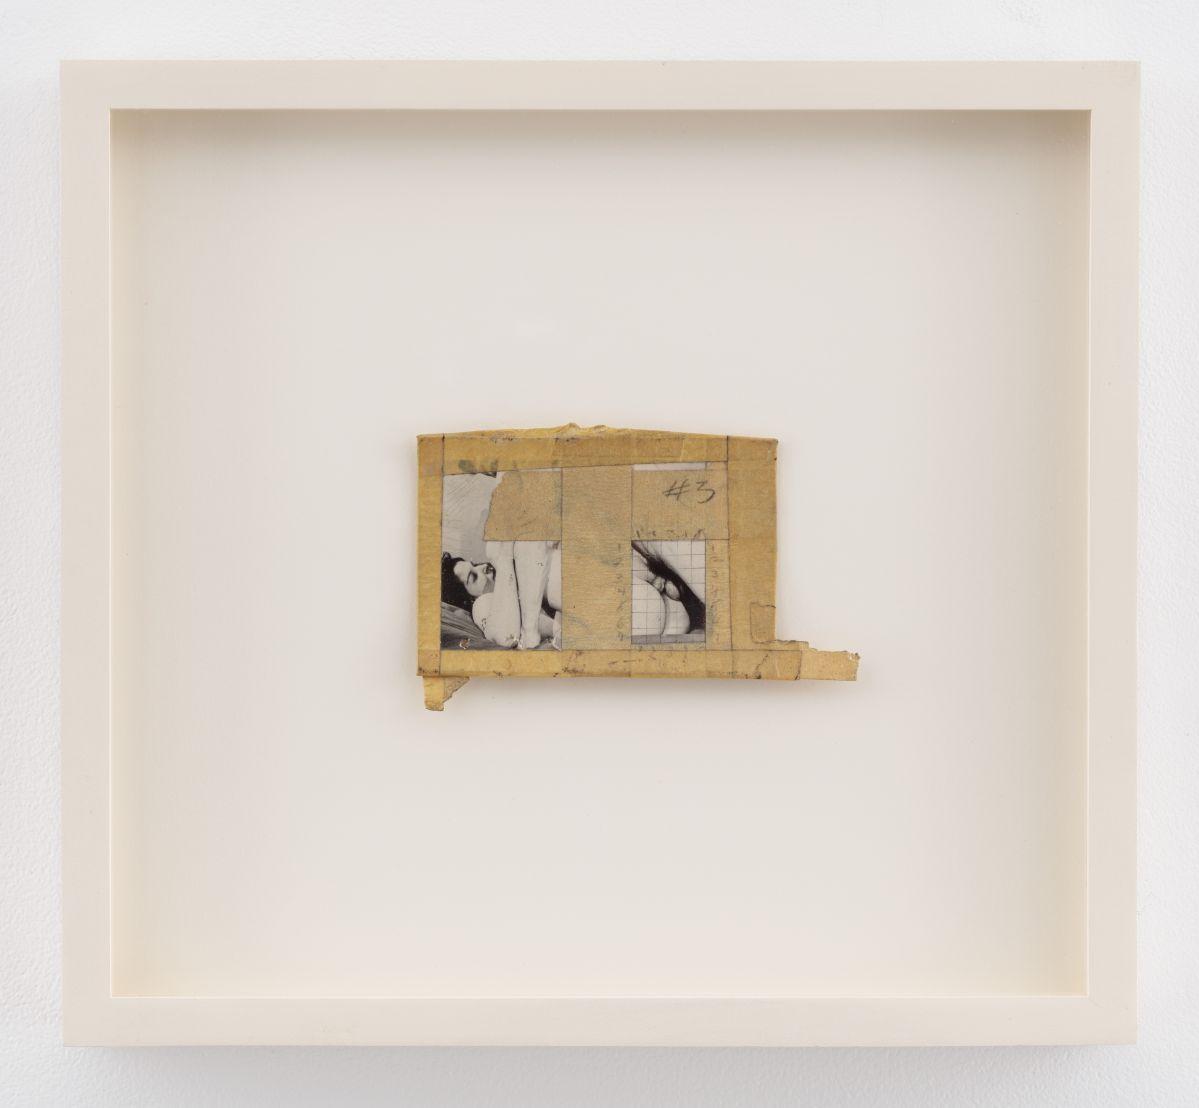 Betty Tompkins - Collage #3, 1970 - Courtesy de l'artiste, P•P•O•W, New York et rodolphe janssen, Bruxelles © Betty Tompkins